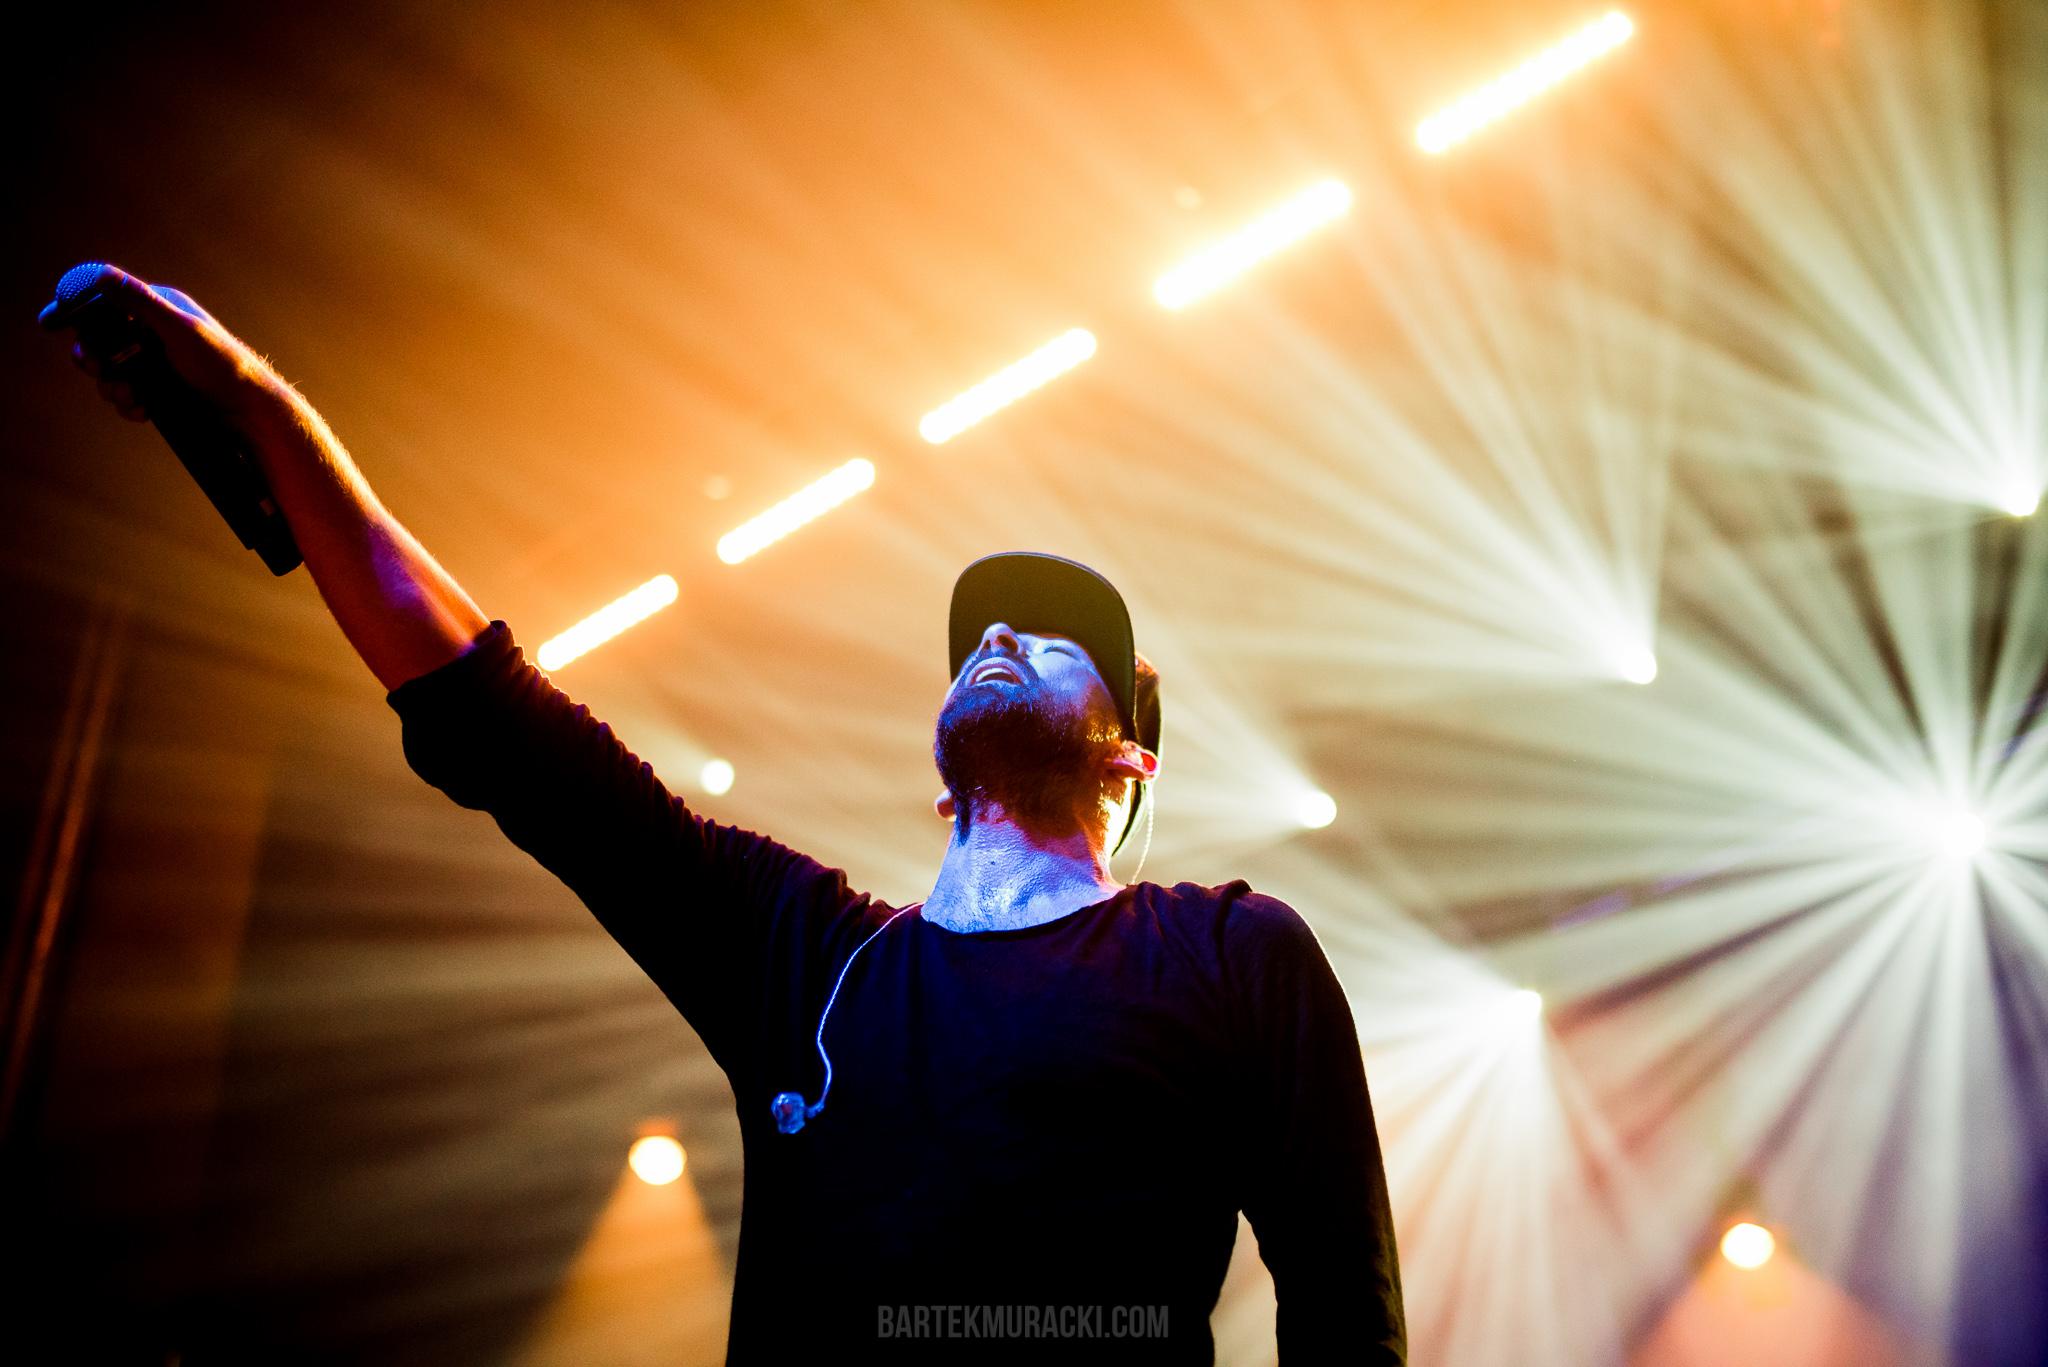 Gentleman-MTV-Unplugged-Spotkania-Kultur-fot-Bartek-Muracki-35-2685